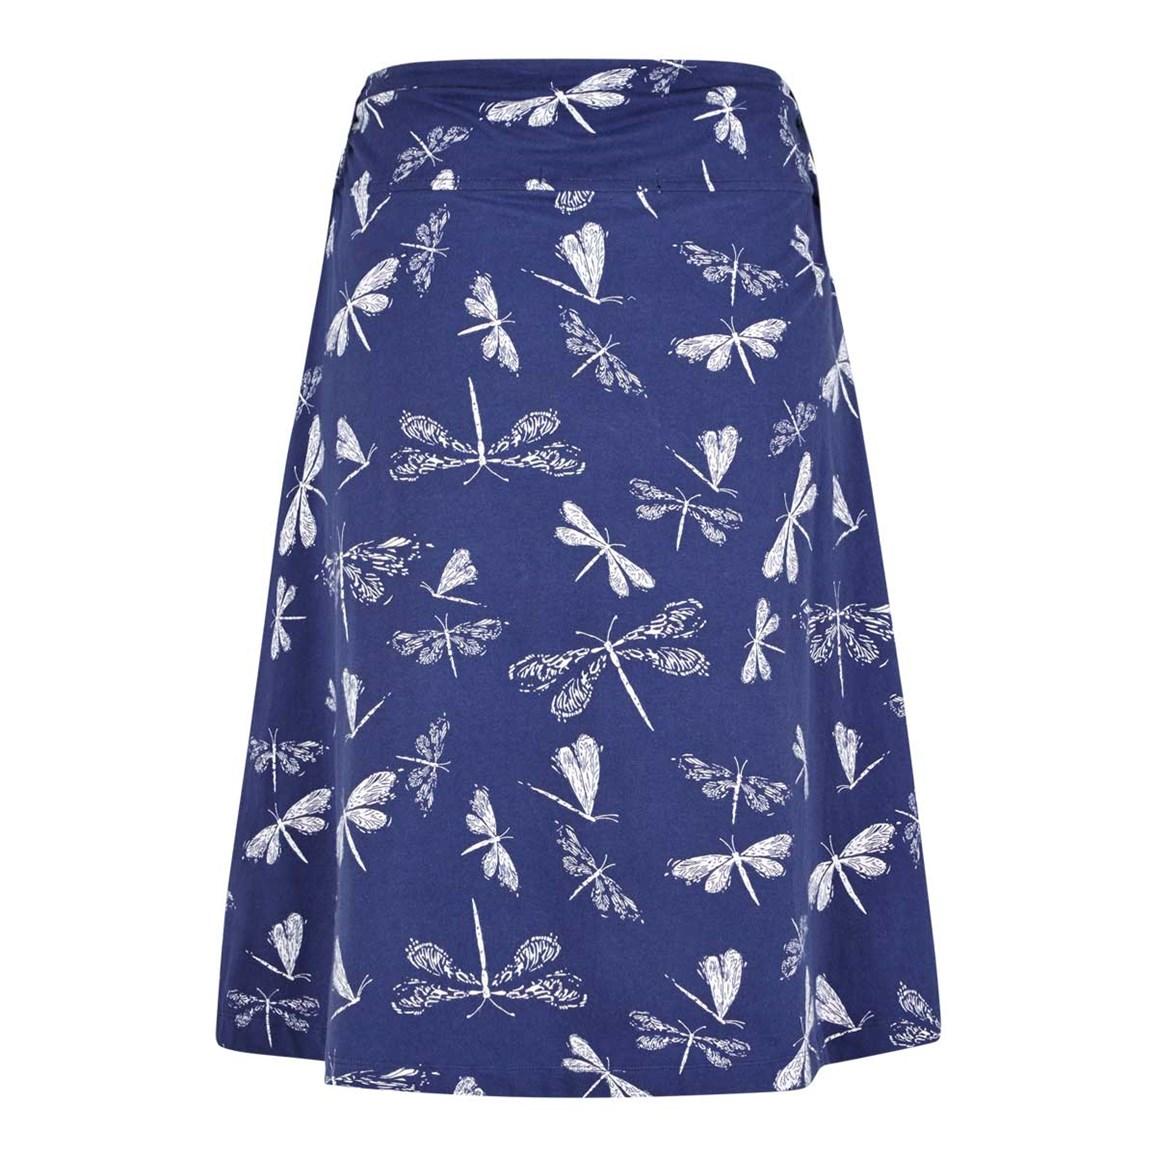 malmo printed jersey skirt navy blue